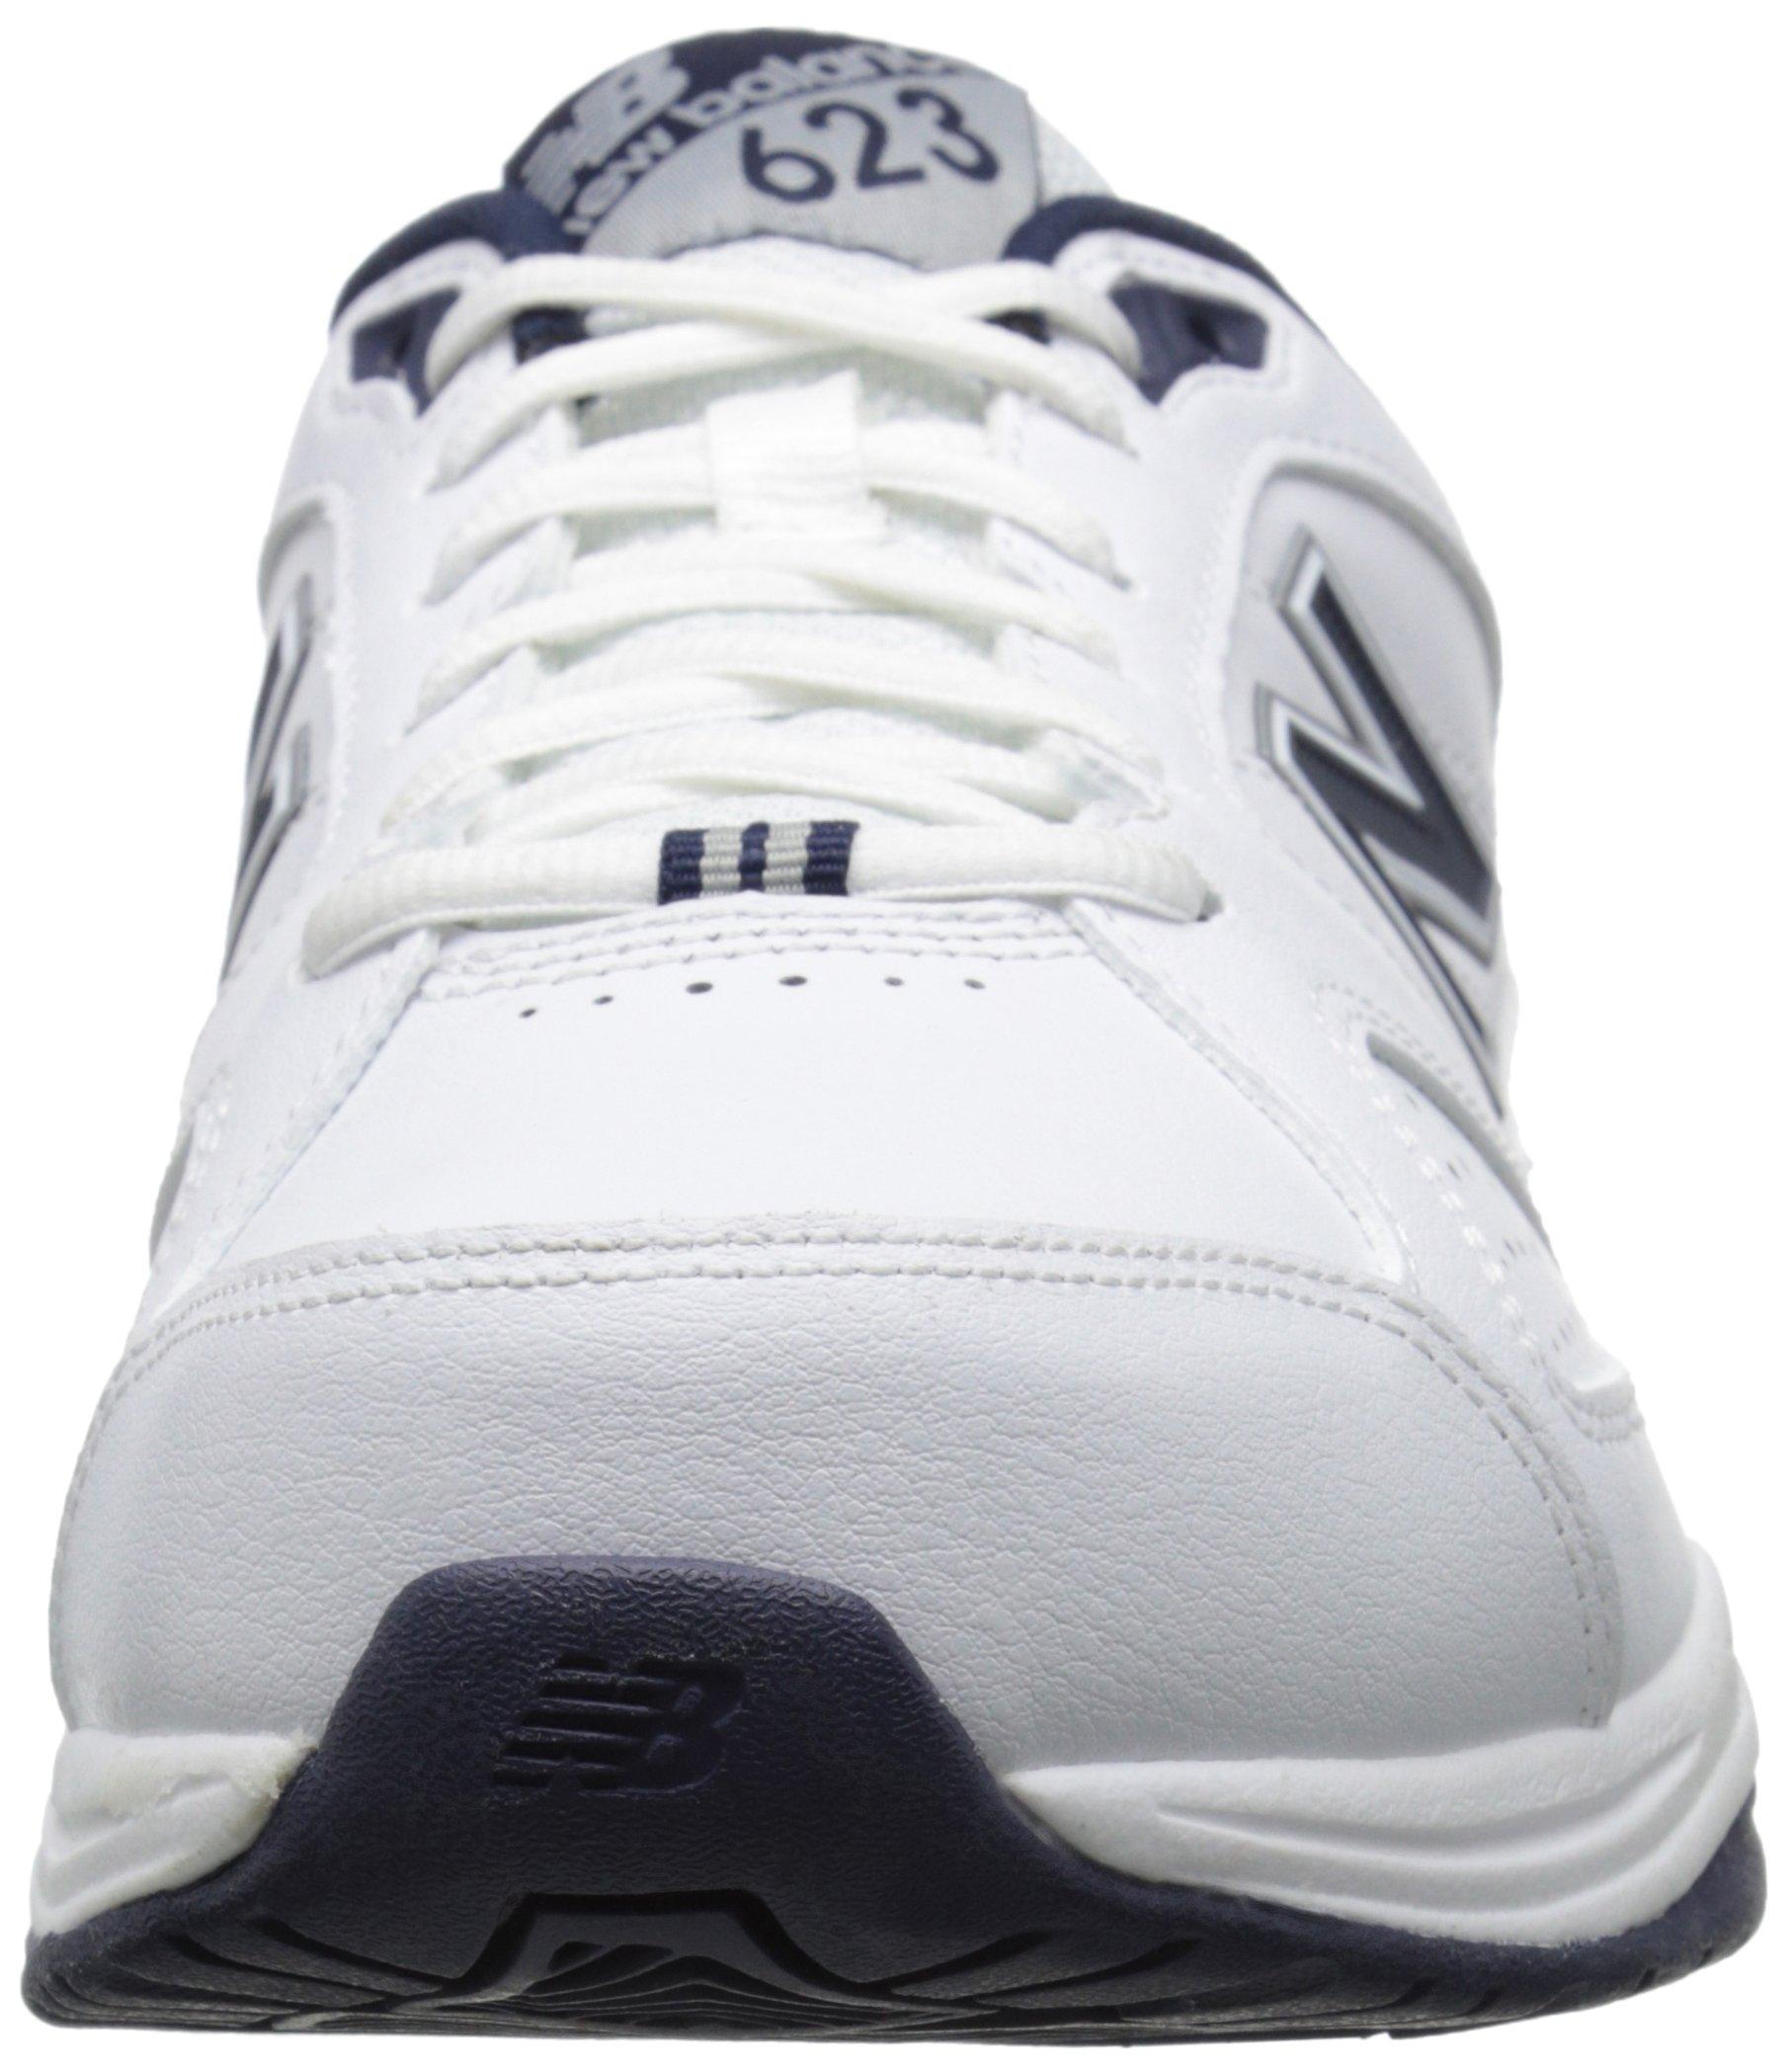 New Balance Men's MX623v3 Casual Comfort Training Shoe,  White/Navy, 8 M US by New Balance (Image #4)